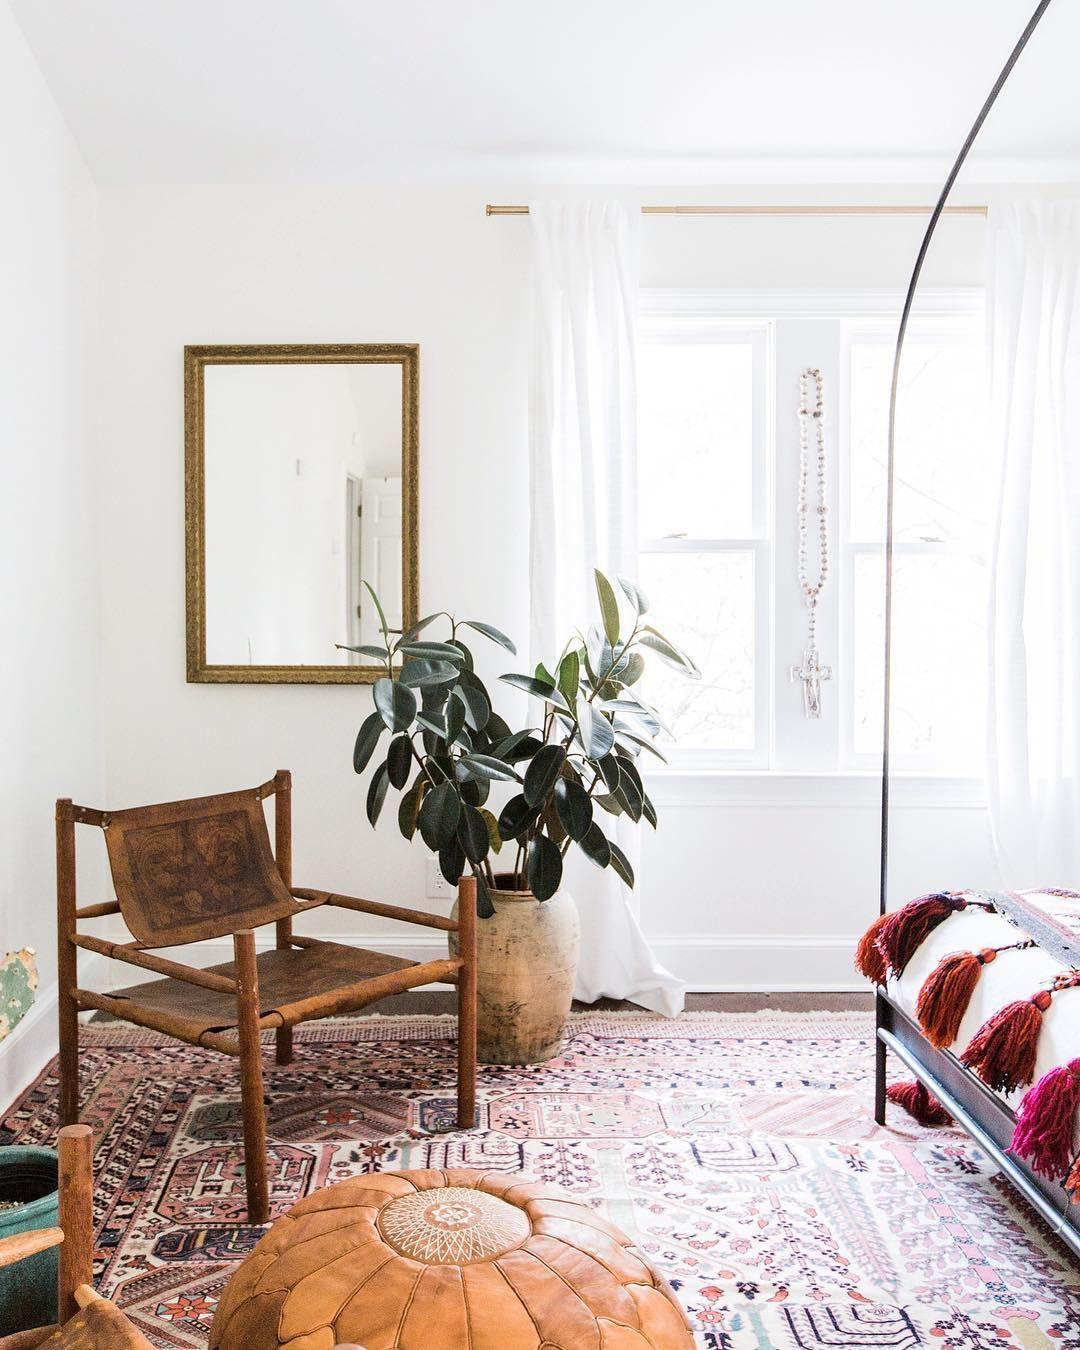 Cozy Corners In @carlaypage's Beautiful Abode. #homestoryinteriors